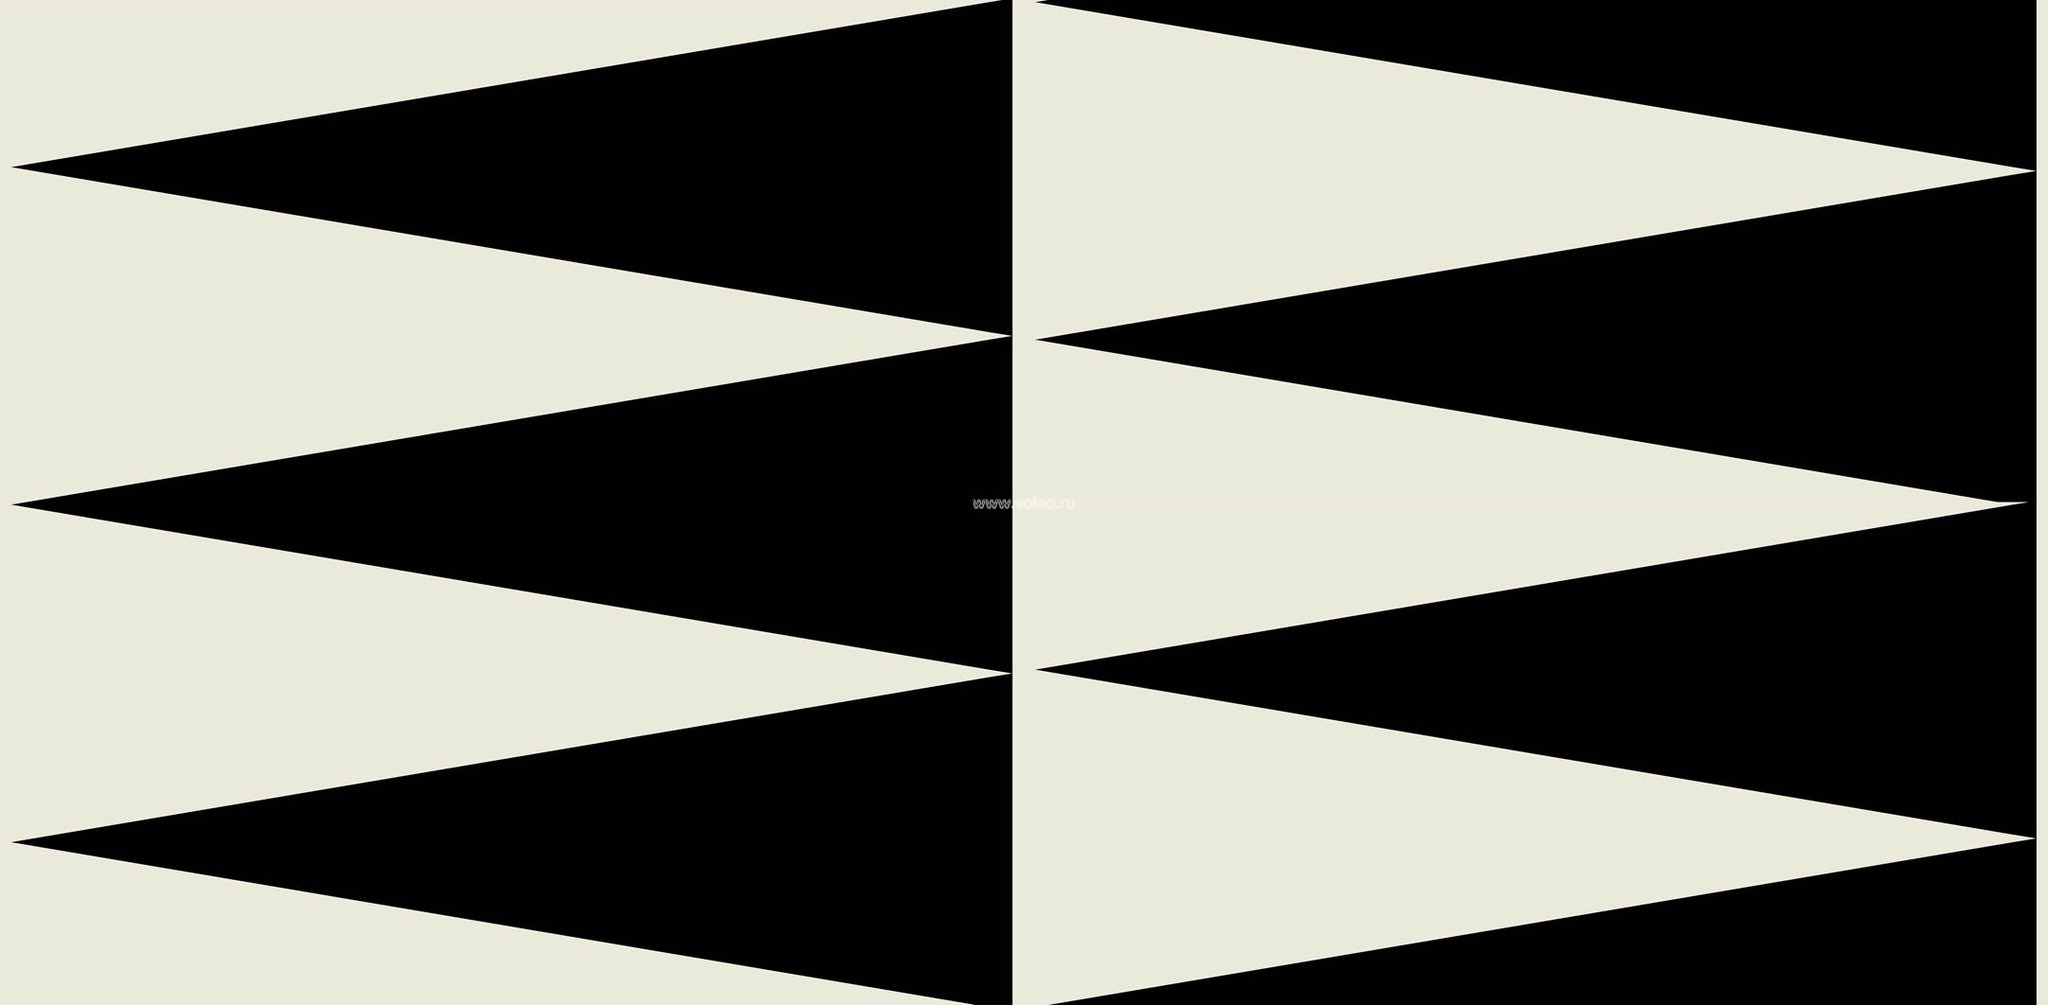 Обои Cole & Son Geometric 93/3010, интернет магазин Волео